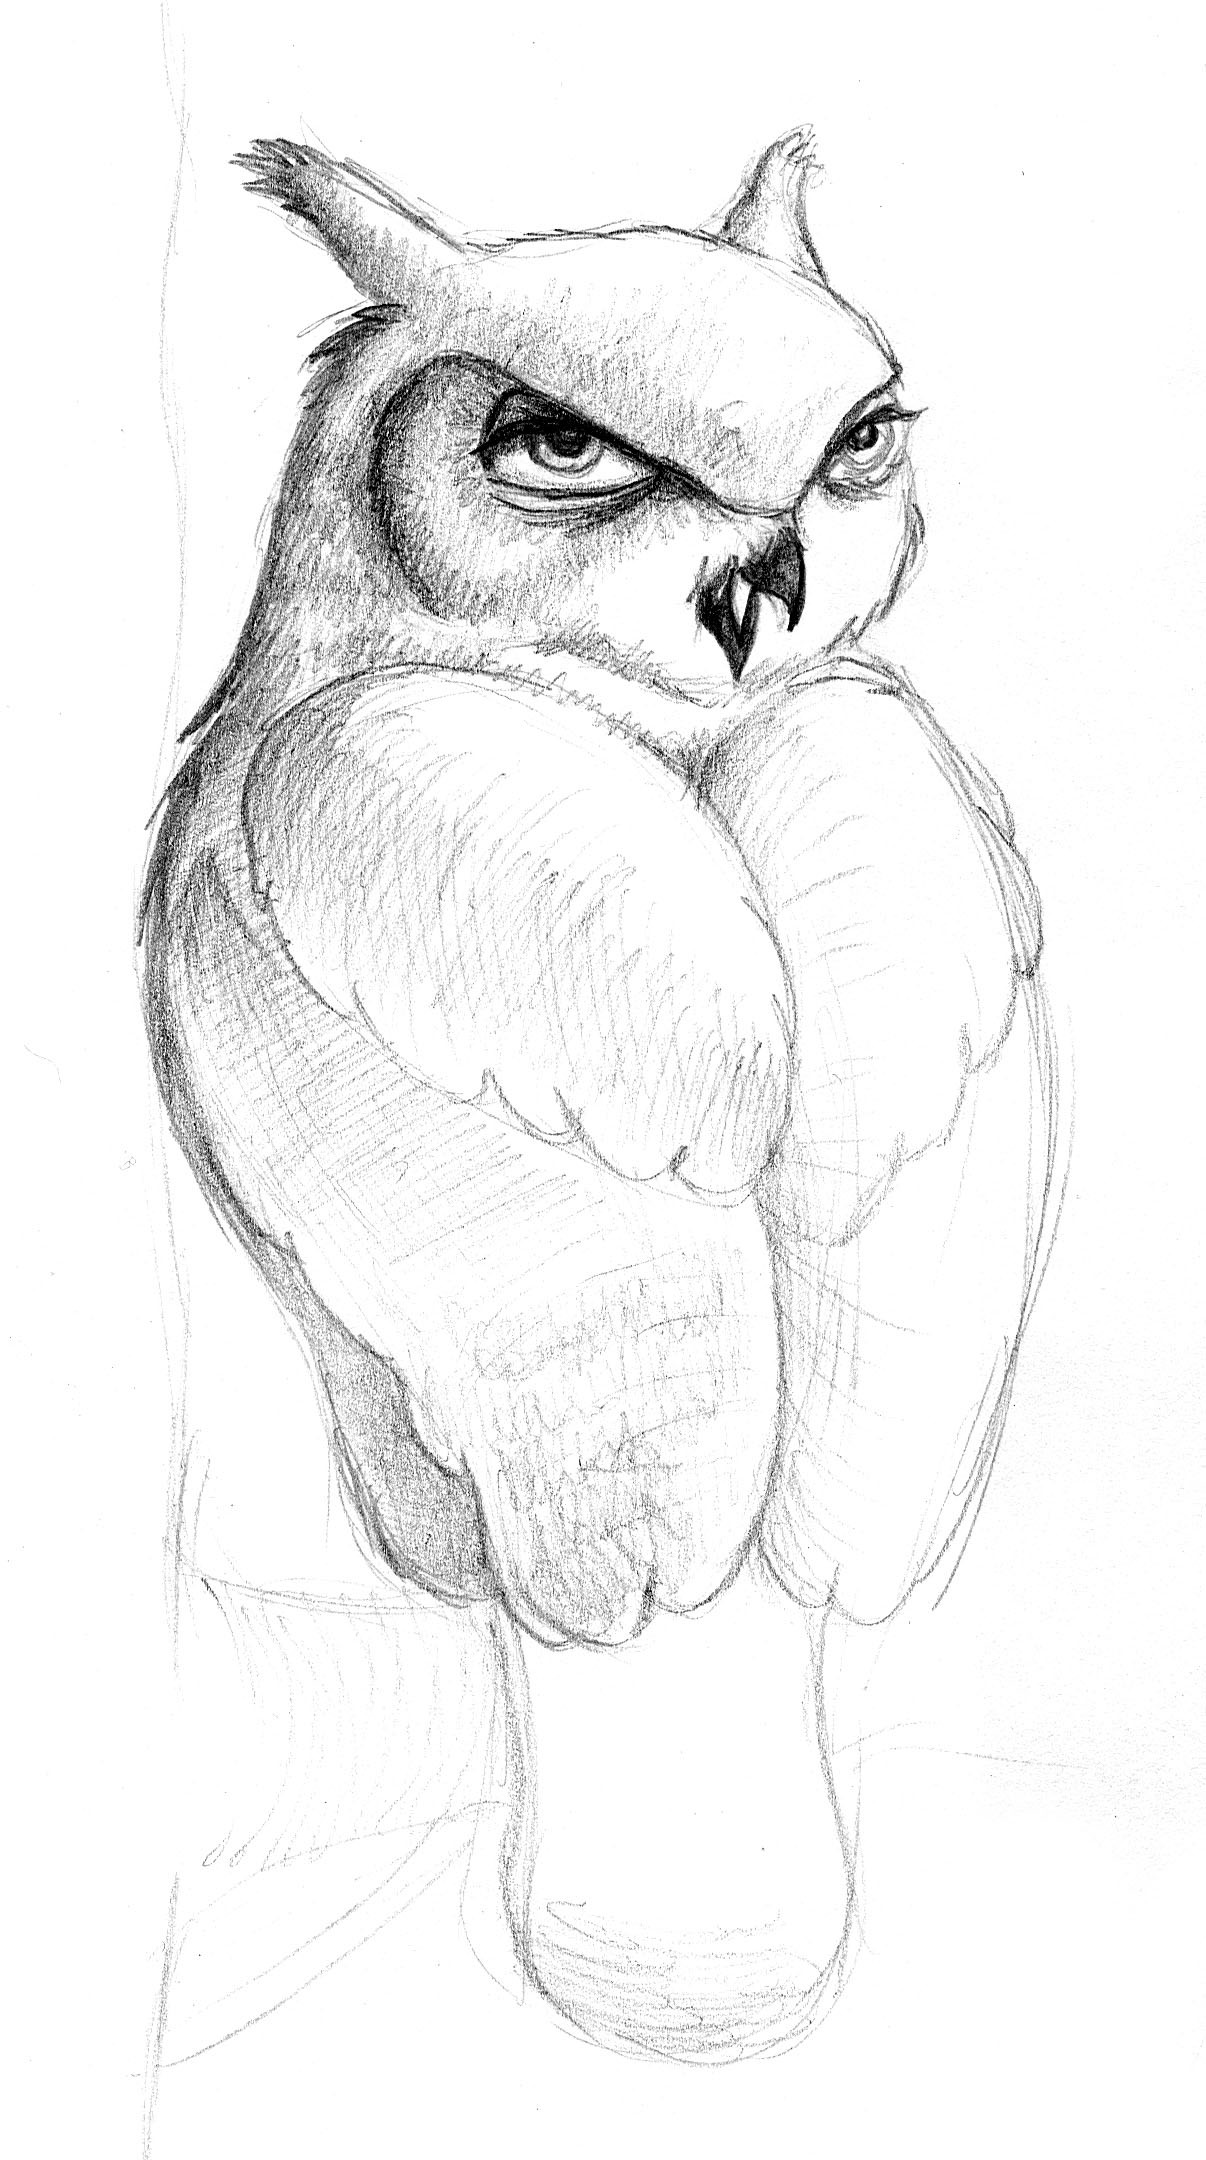 Patricia vasquez de velasco animales bocetos 01a